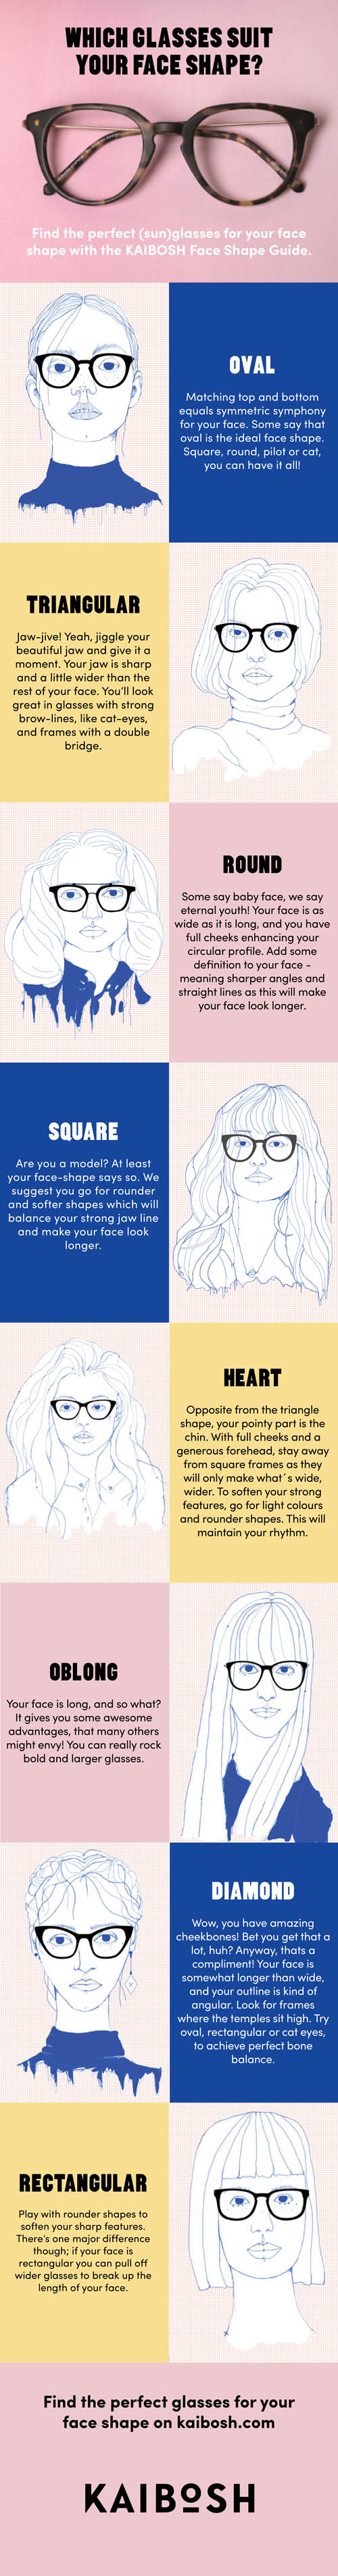 KAIBOSH   Face Shape Guide for Glasses   Shop glasses now on www ...